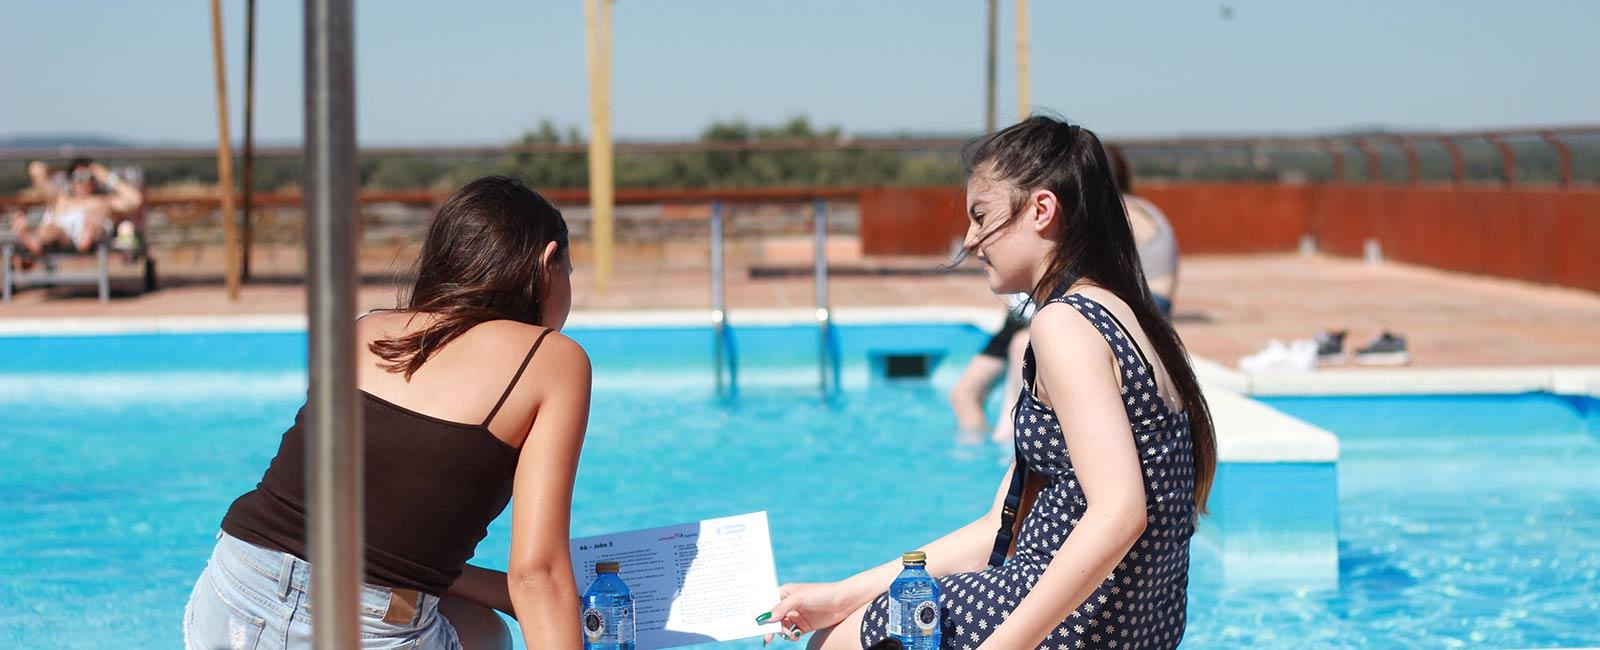 inmersion-chicas-onetoone-piscina-2.jpg